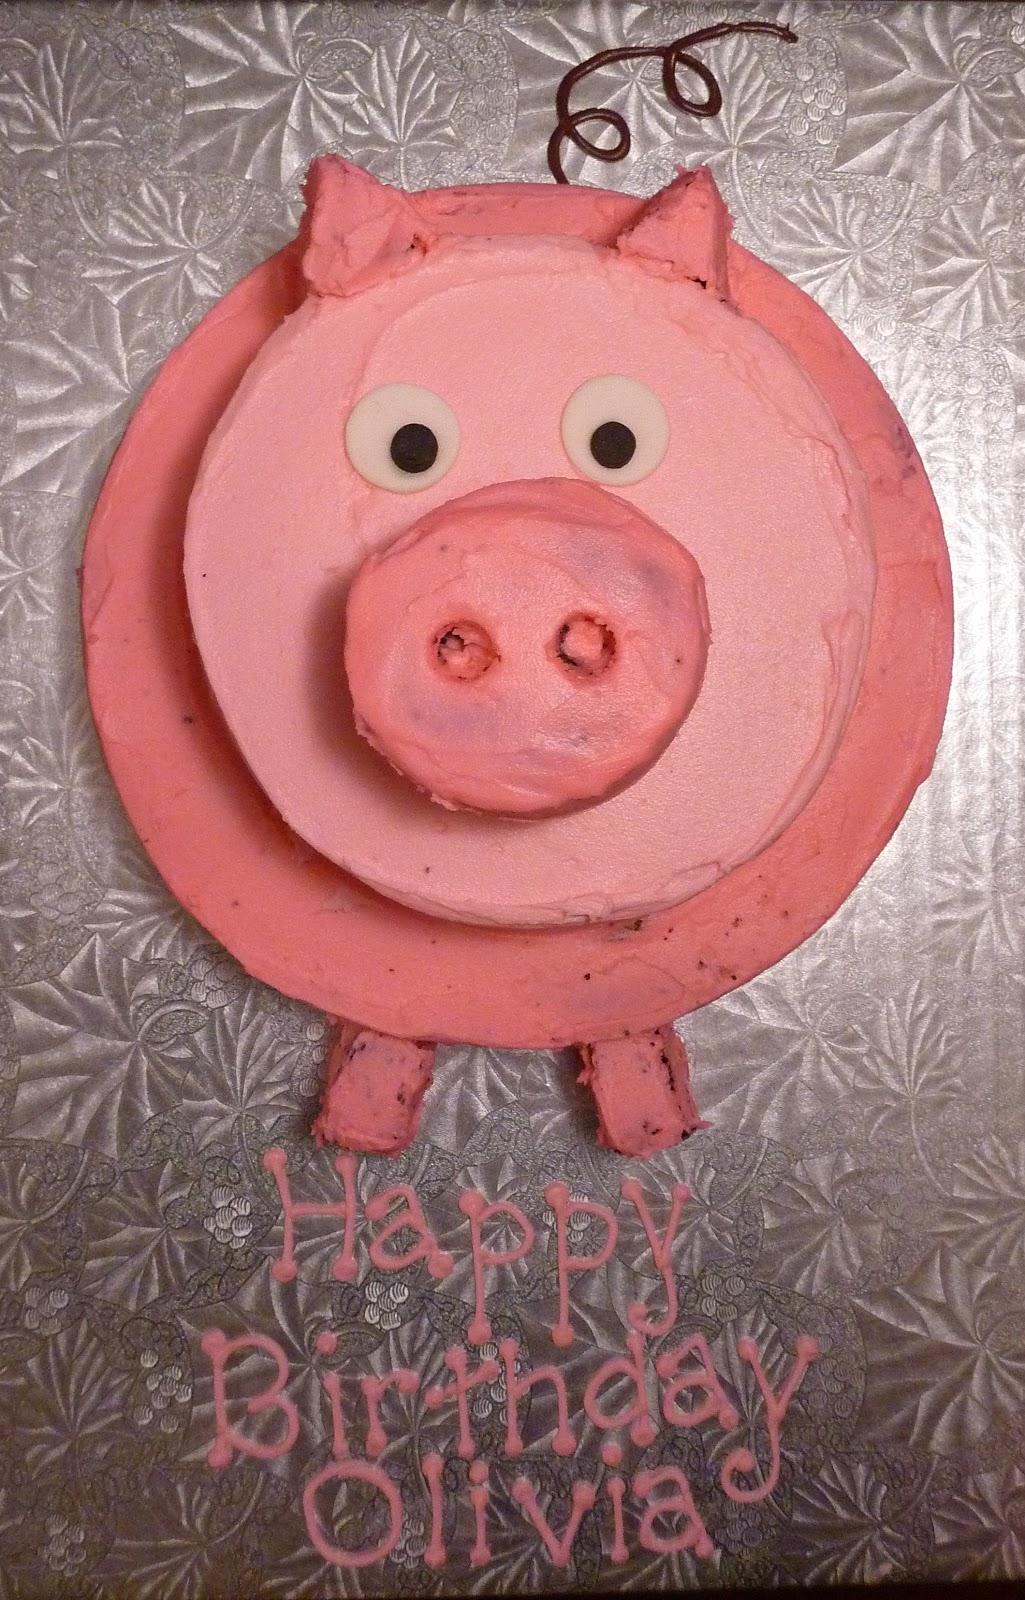 Kel S Cakes Birthday Cakes